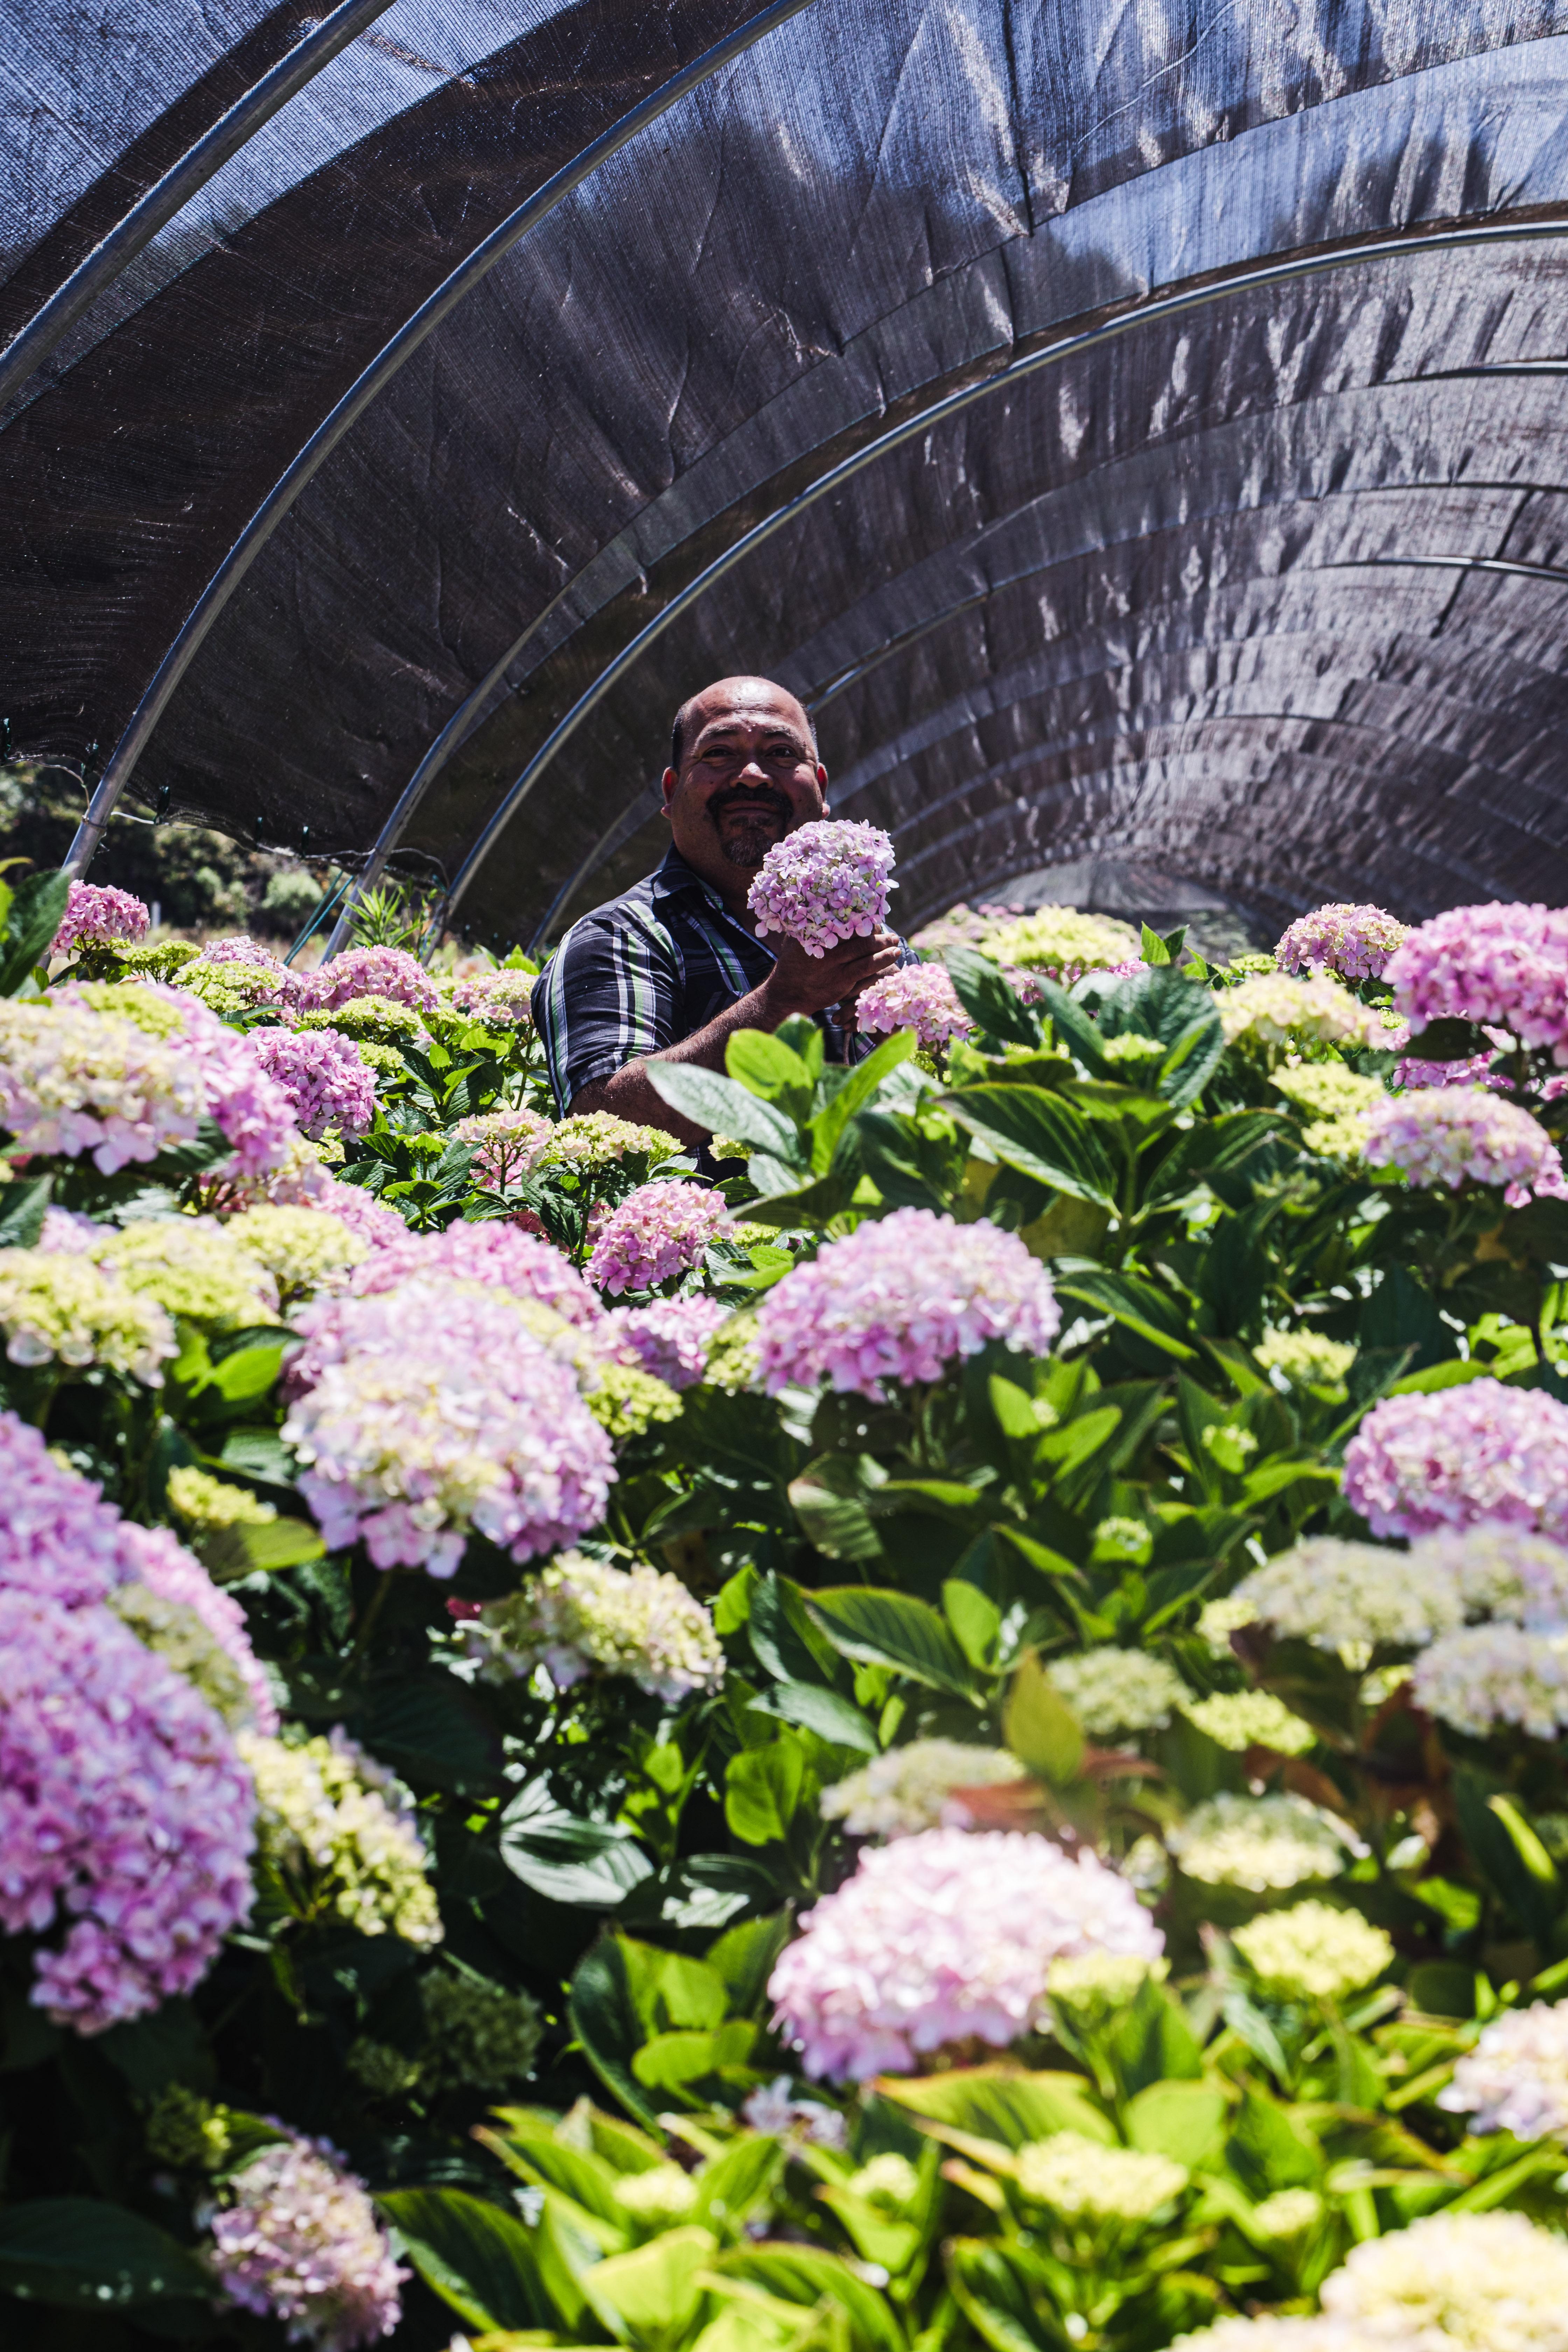 Scenes from JSM Organics flower growing operation with founder Javier Zamora.